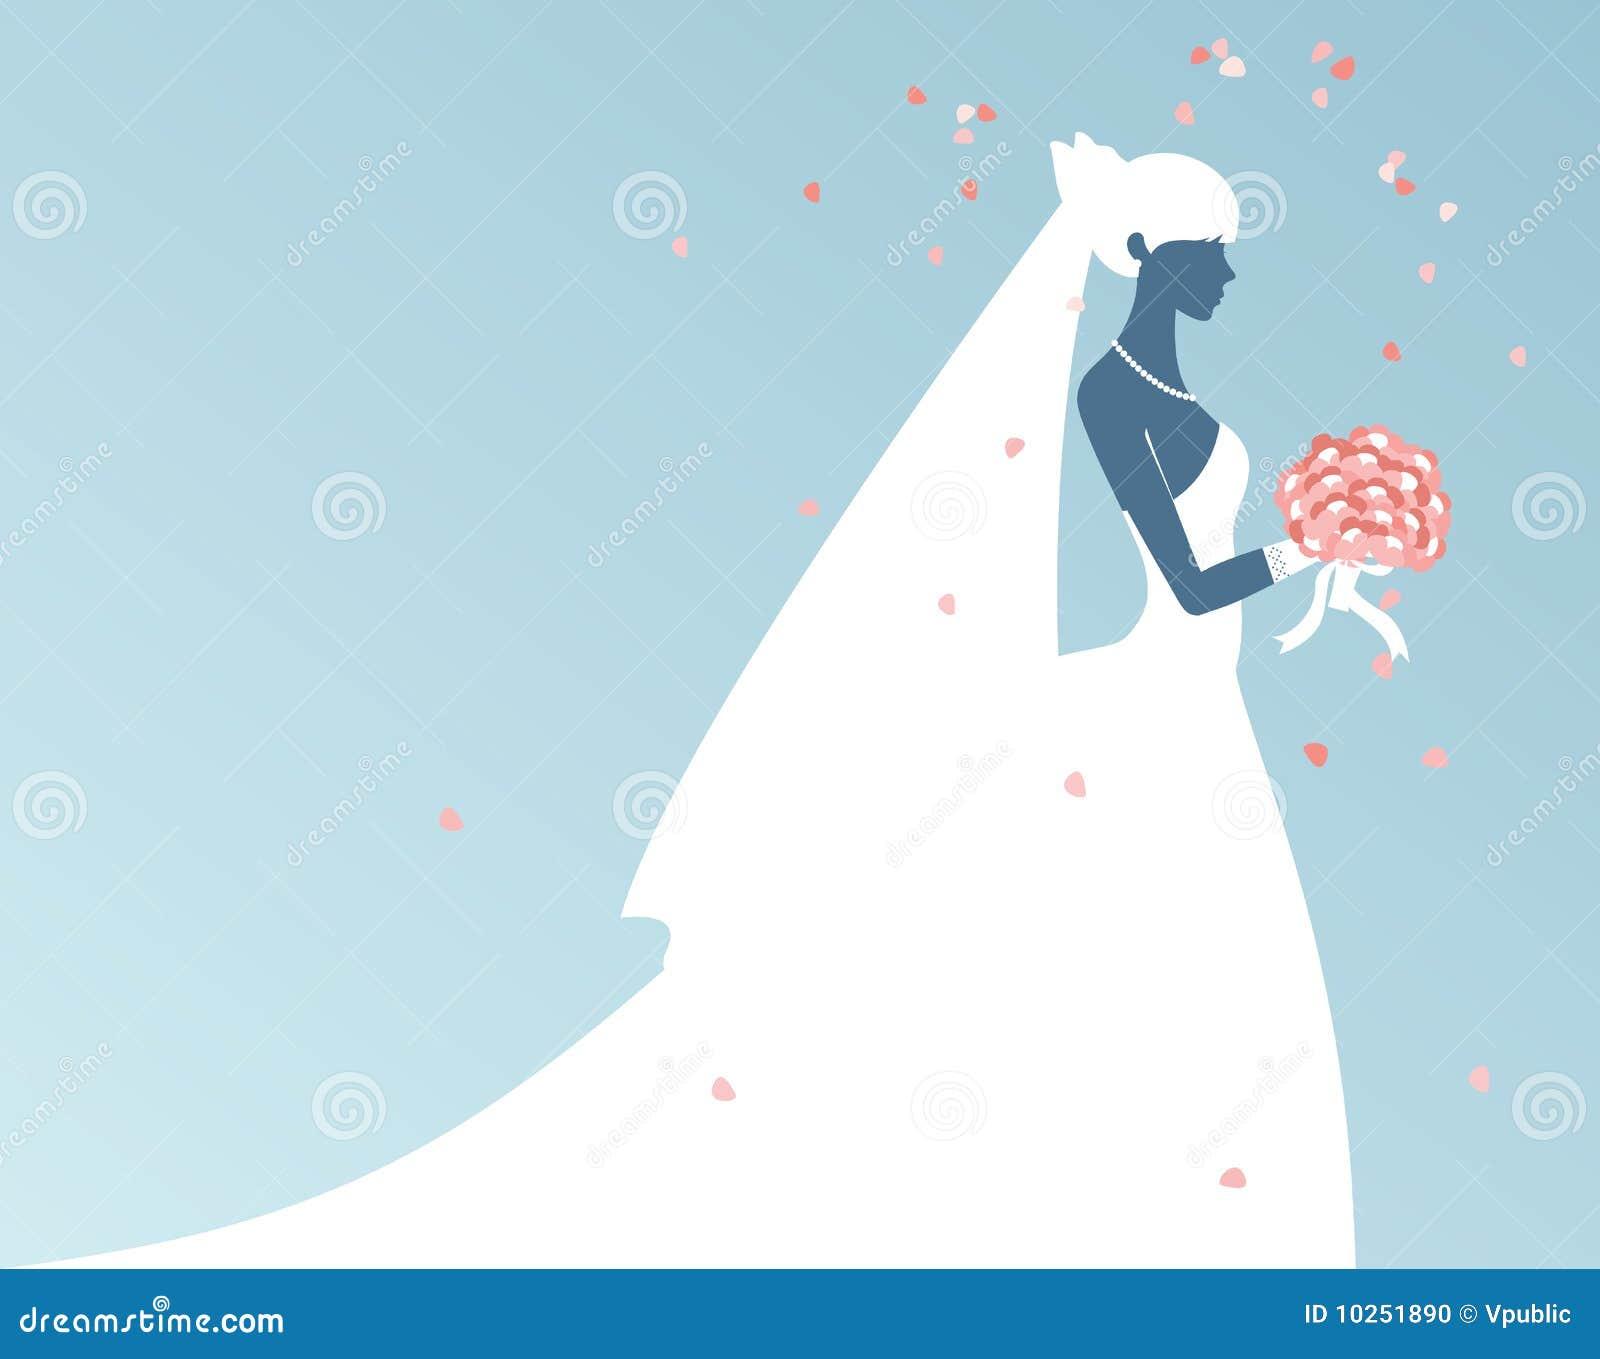 Bridal Shower Free Invitations is adorable invitation ideas